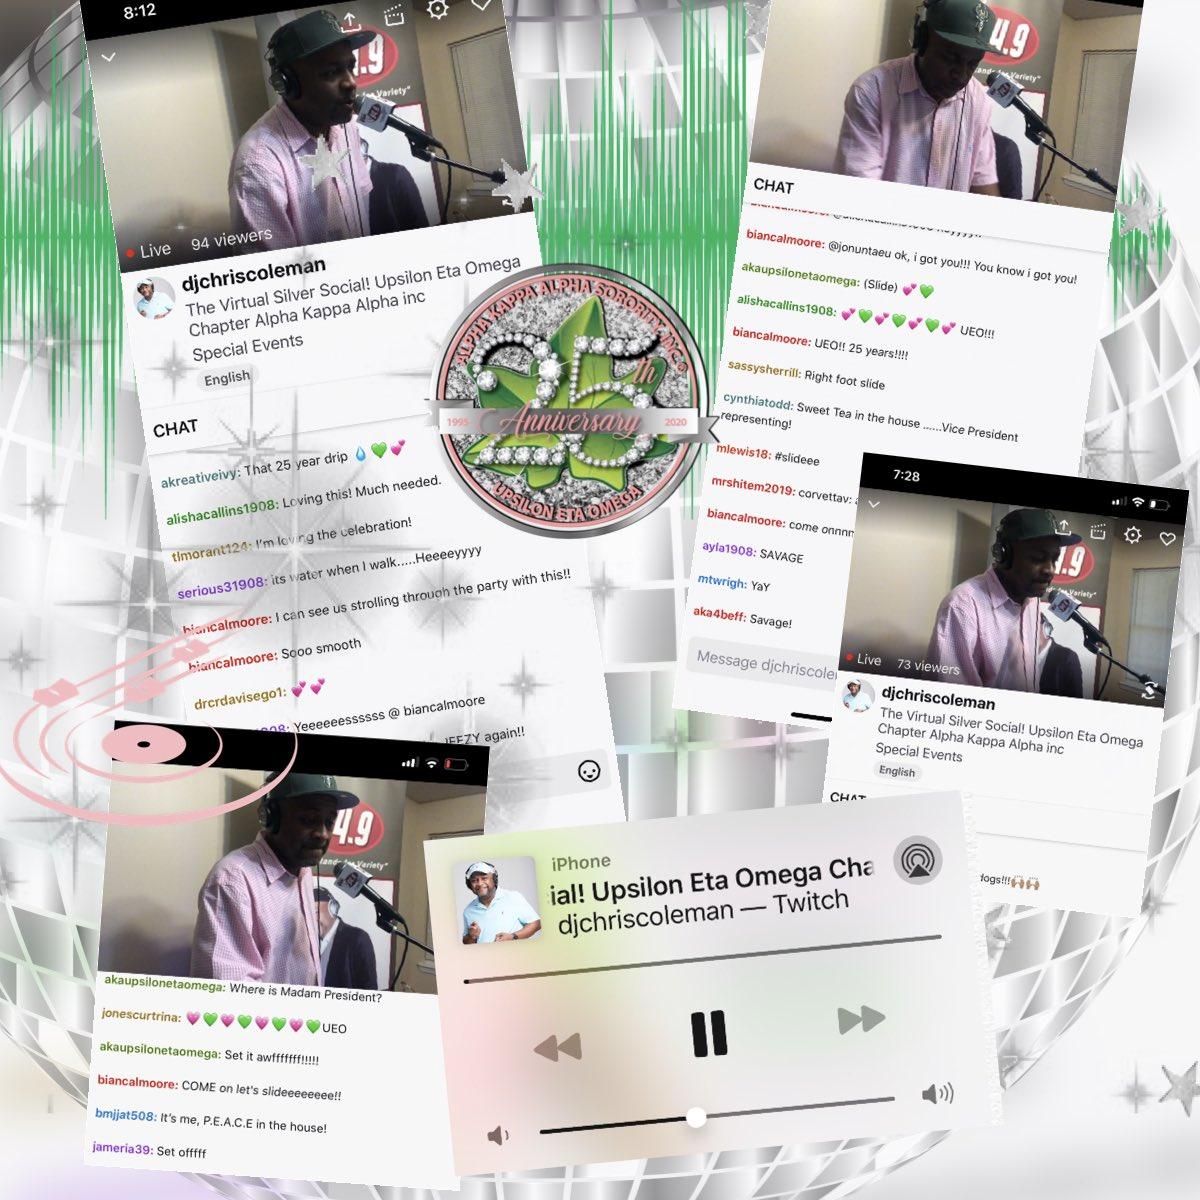 Thank you to  @DJChrisColeman1 for a super fantastic virtual Silver Social!   Happy 25th Anniversary Upsilon Eta Omega! #AKAUEOTurns25  #AKA1908 #AKASouthEastern #AKAUEO #AKAUpsilonEtaOmega @akasorority1908pic.twitter.com/h77lokrVHN